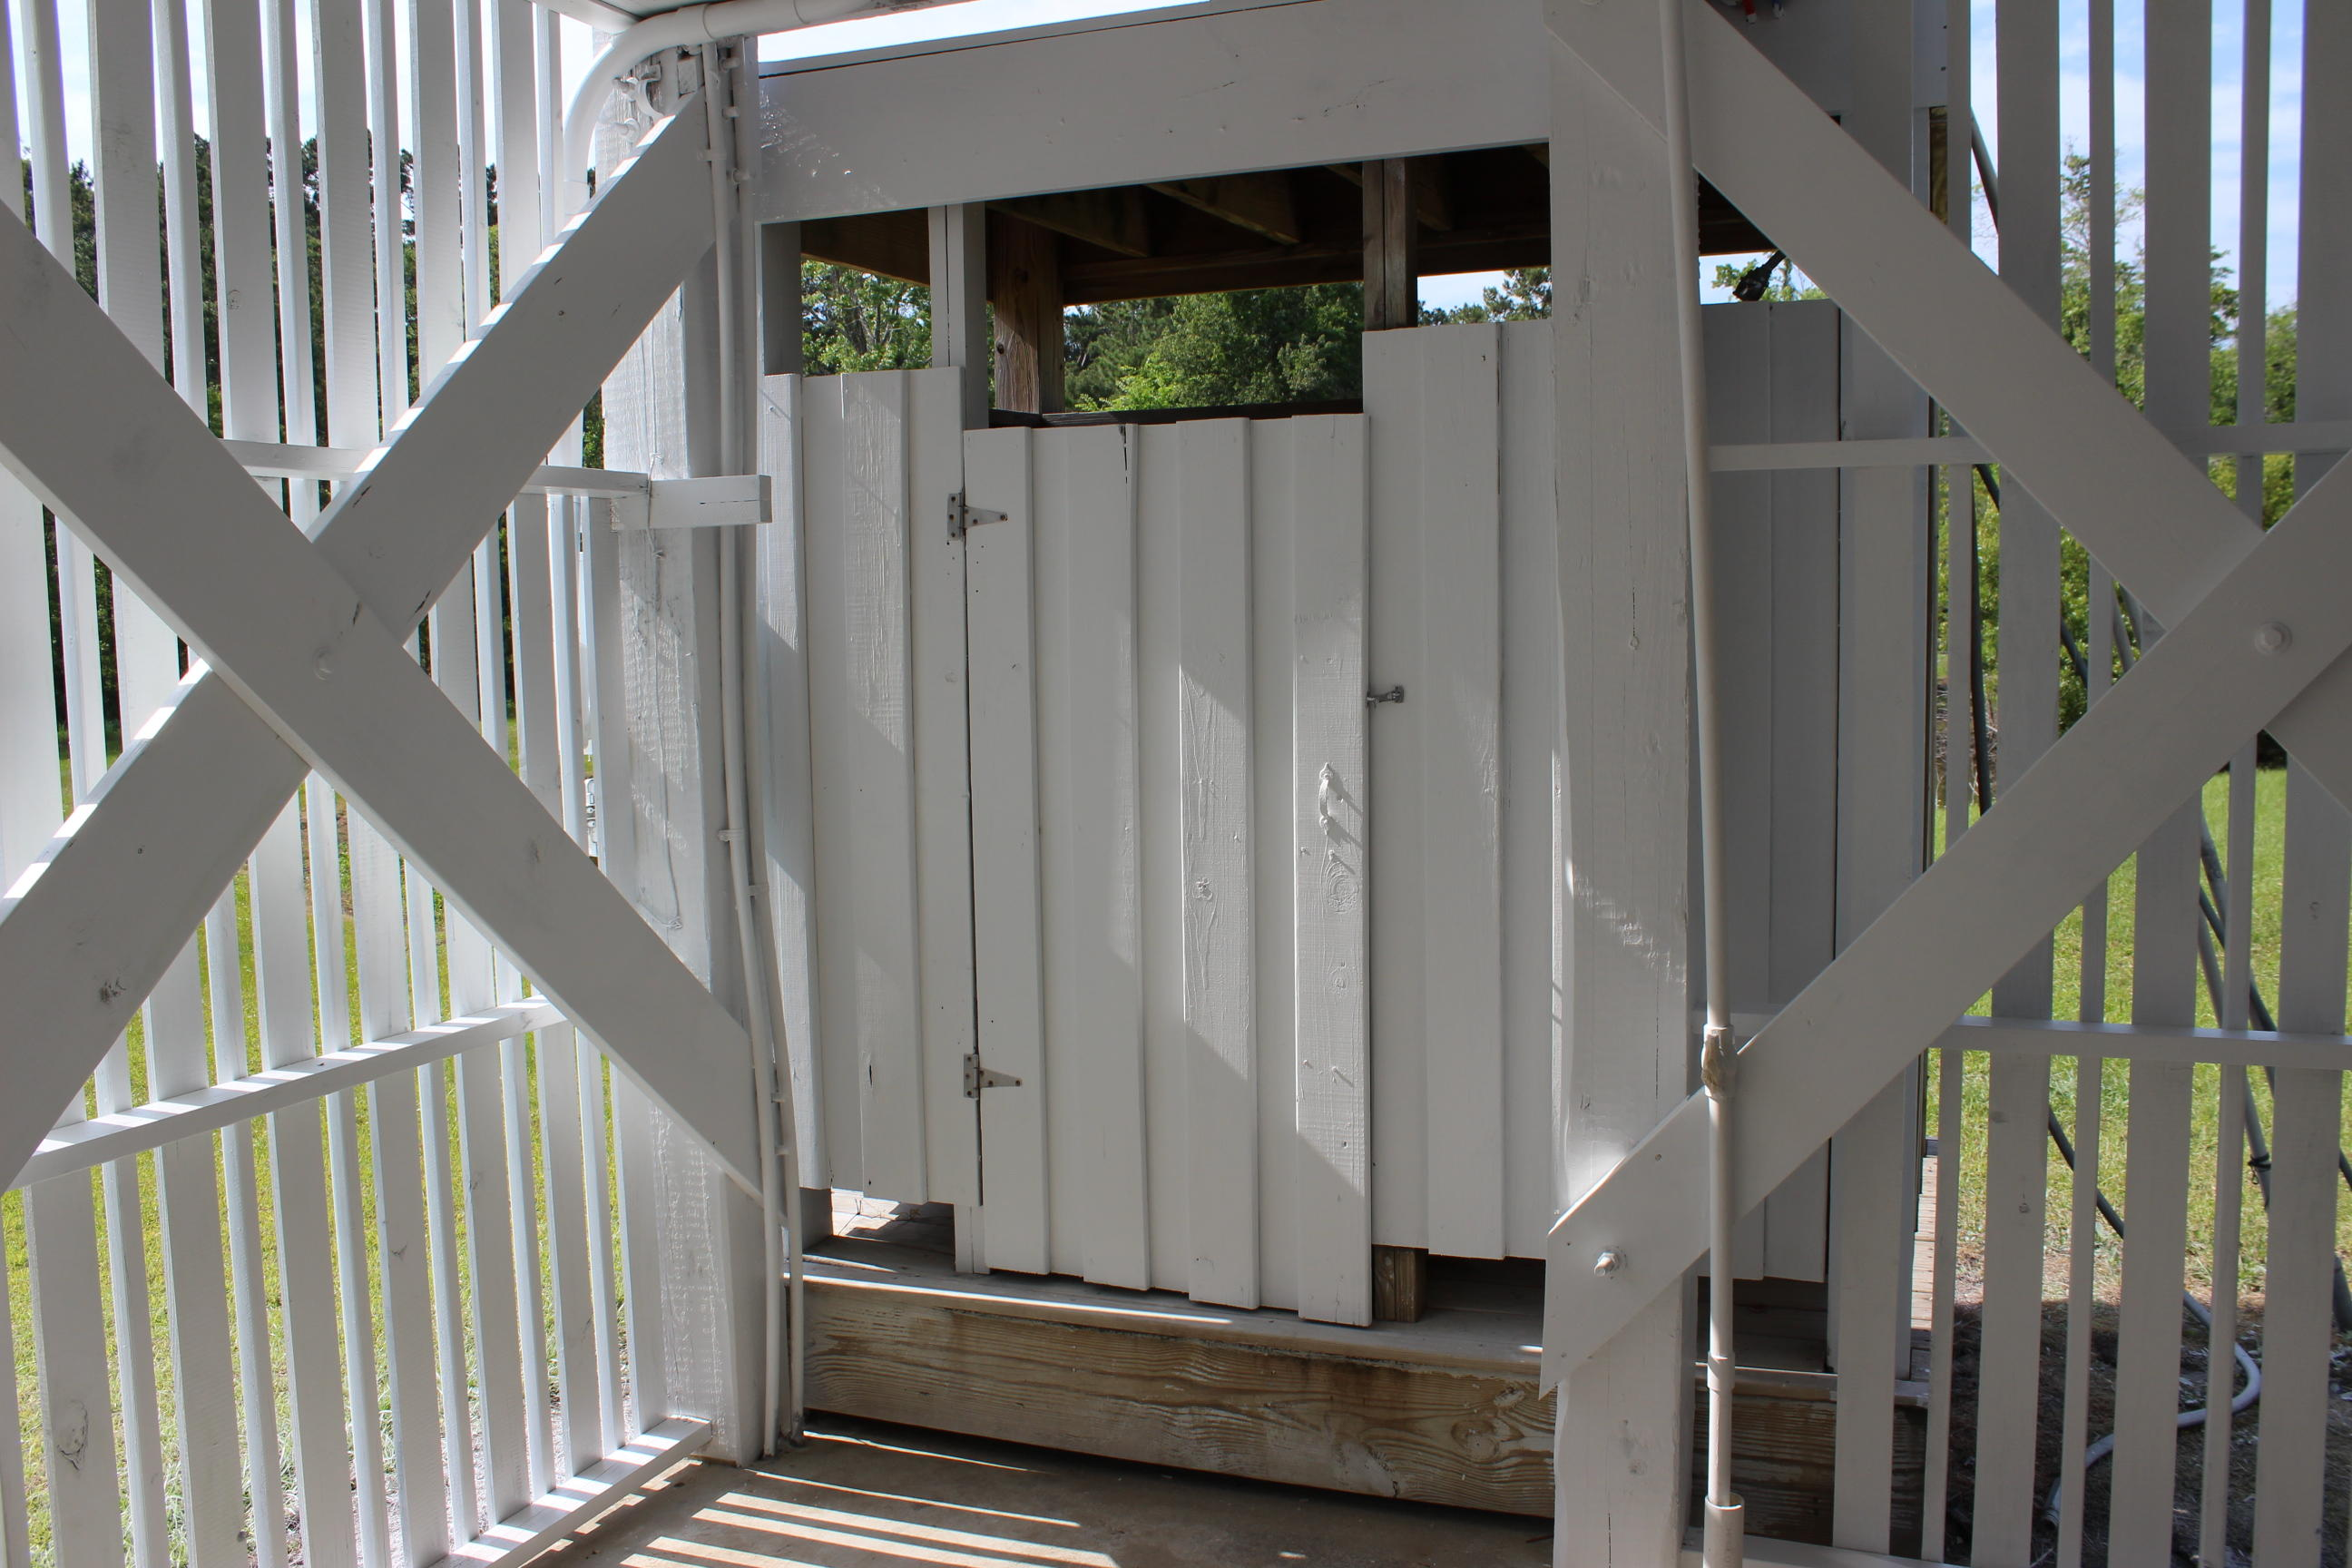 Edisto Island Homes For Sale - 8184 Oyster Factory, Edisto Island, SC - 9